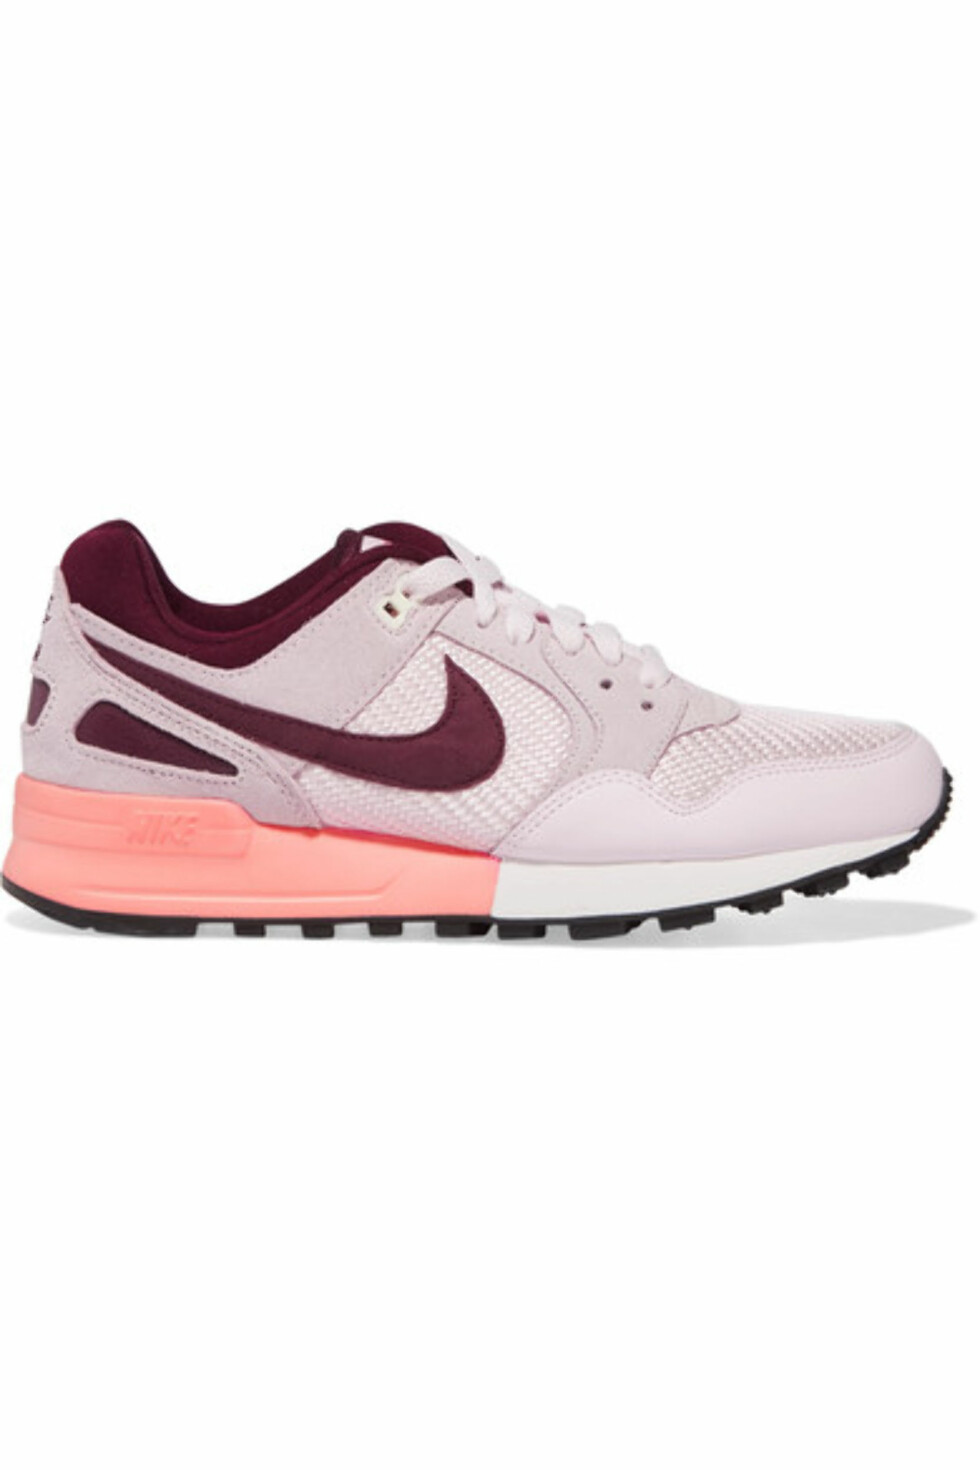 Sneakers fra Nike via Net-a-porter.com, kr 441.